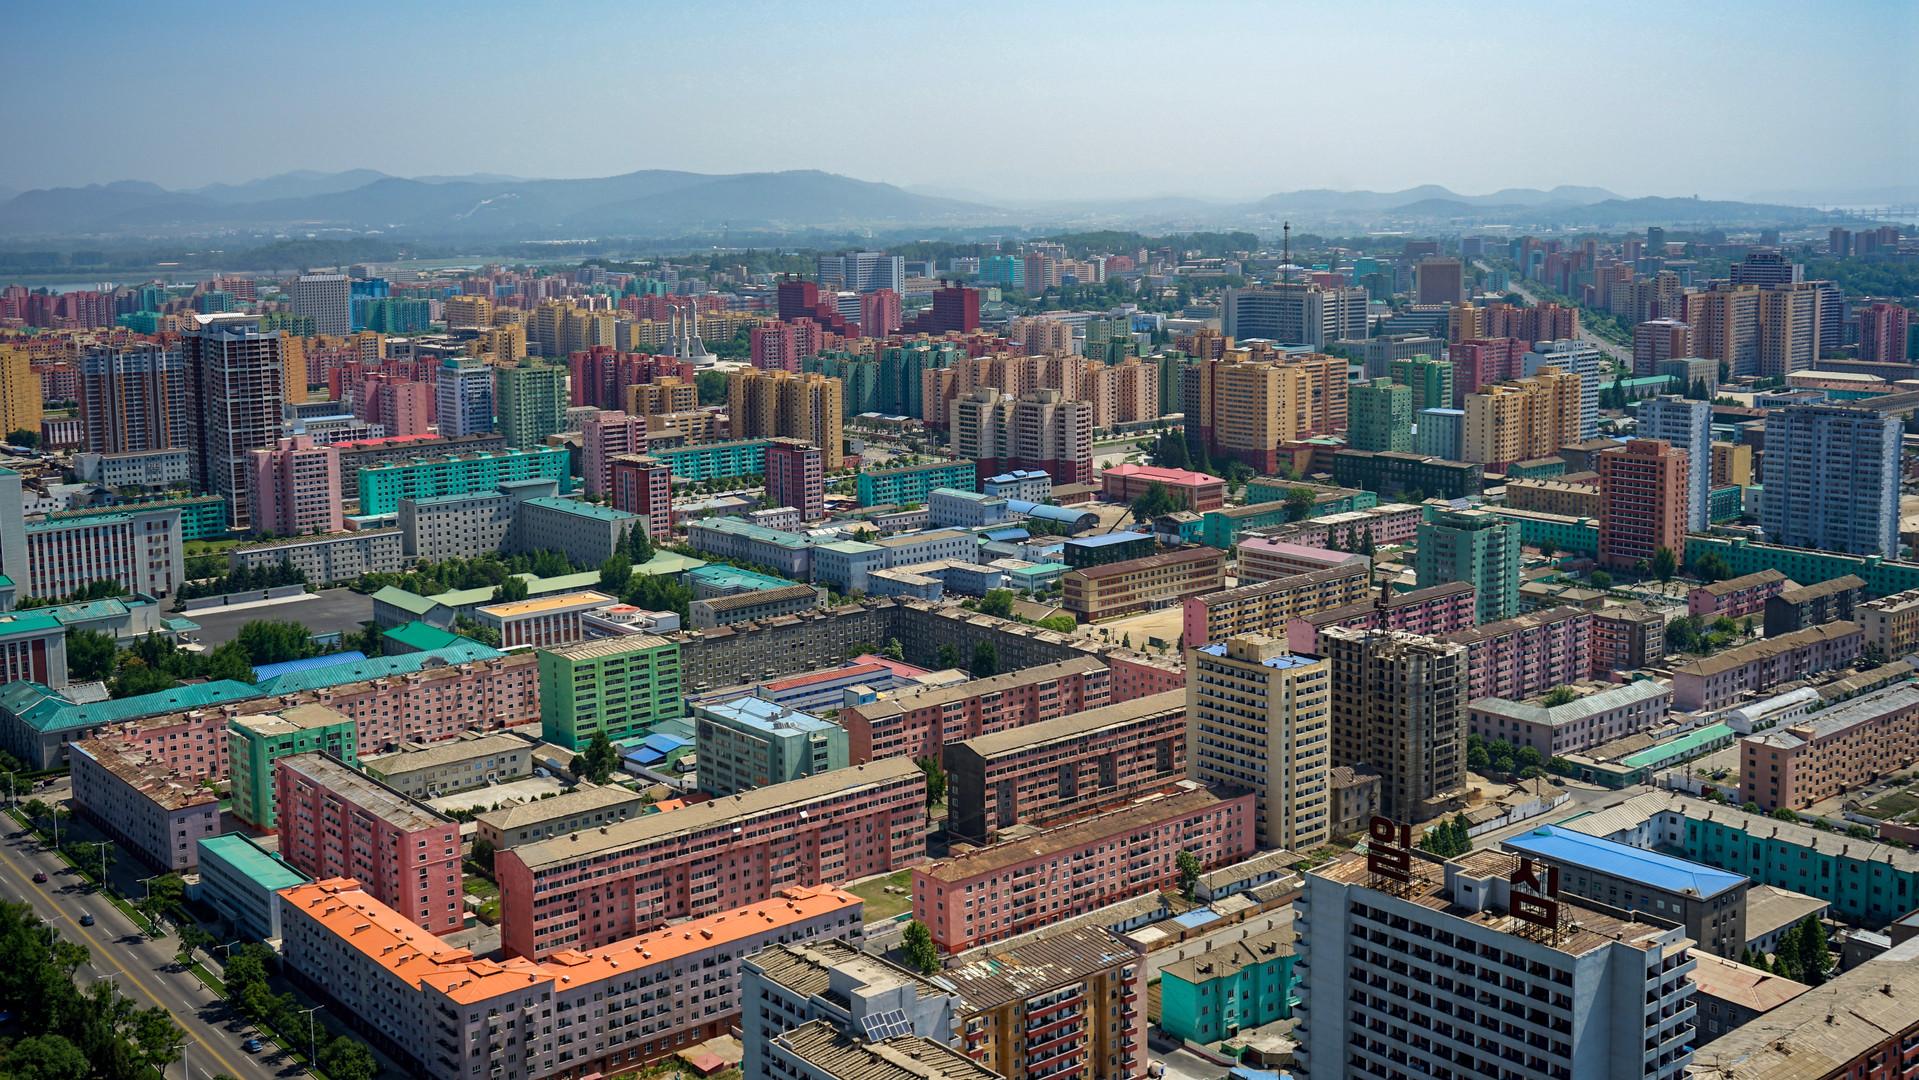 Skyline of NK